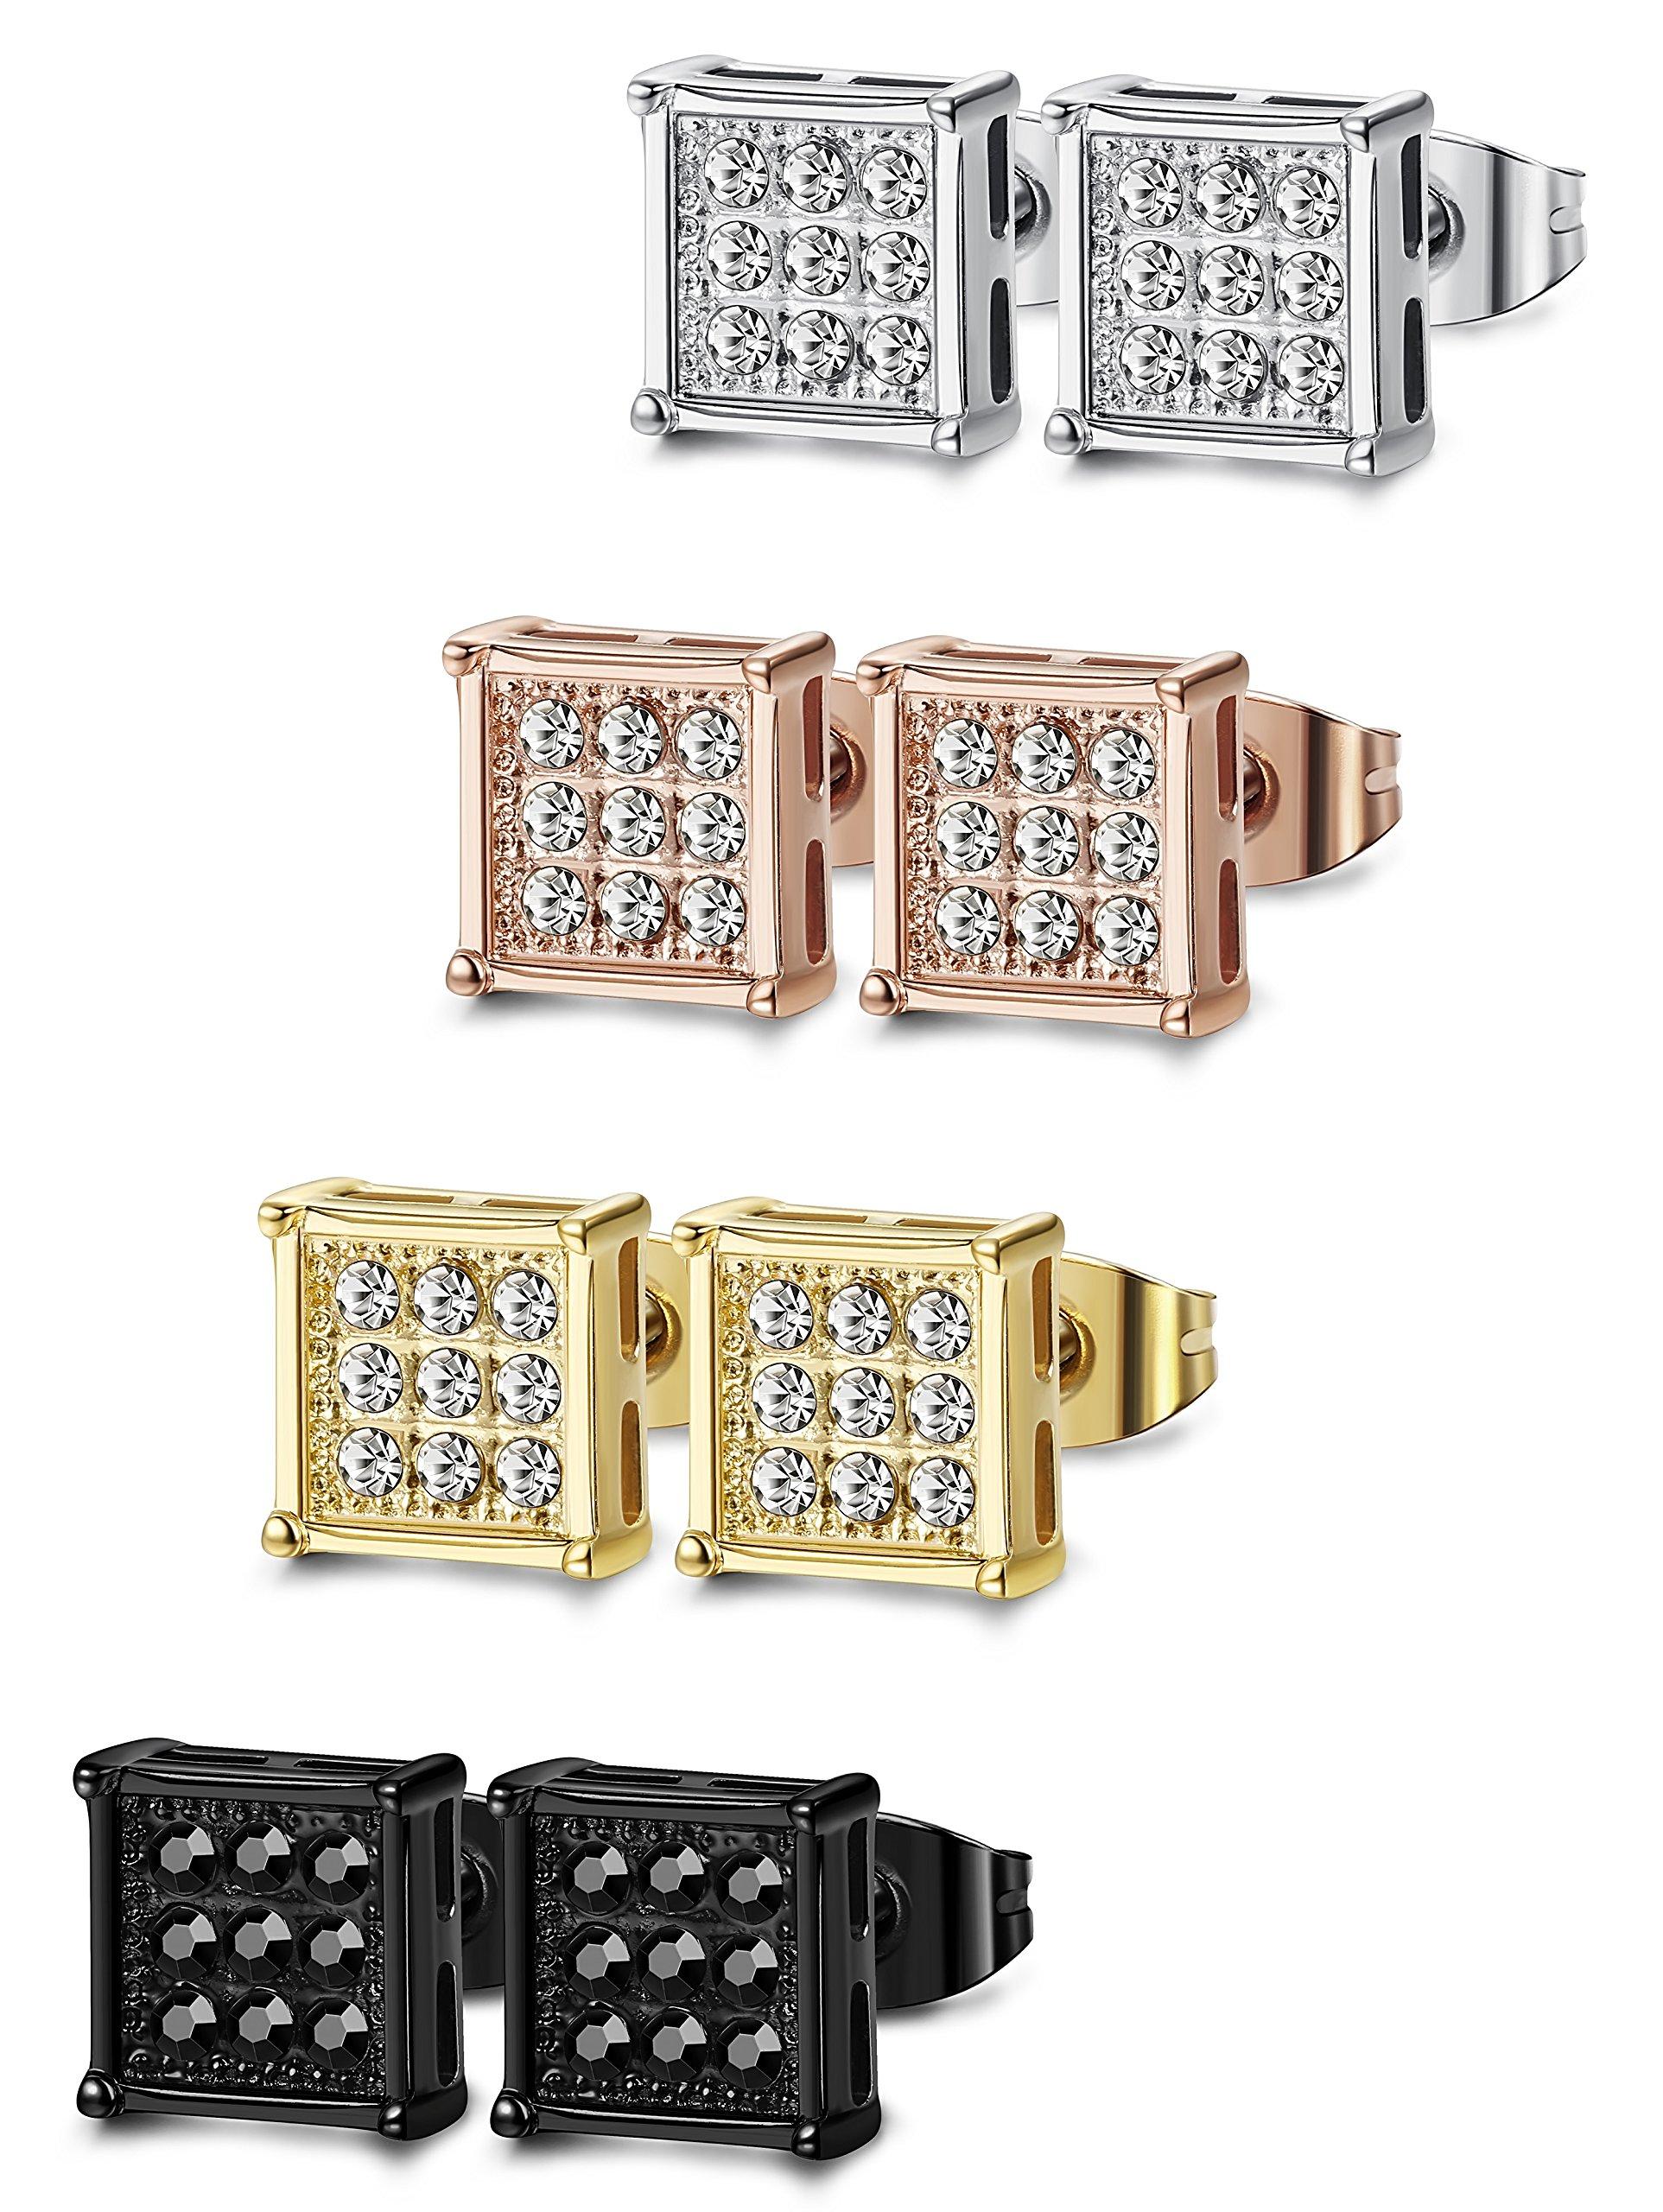 FIBO STEEL 4 Pairs Stainless Steel Stud Earrings for Men Women Square CZ Earrings,6MM